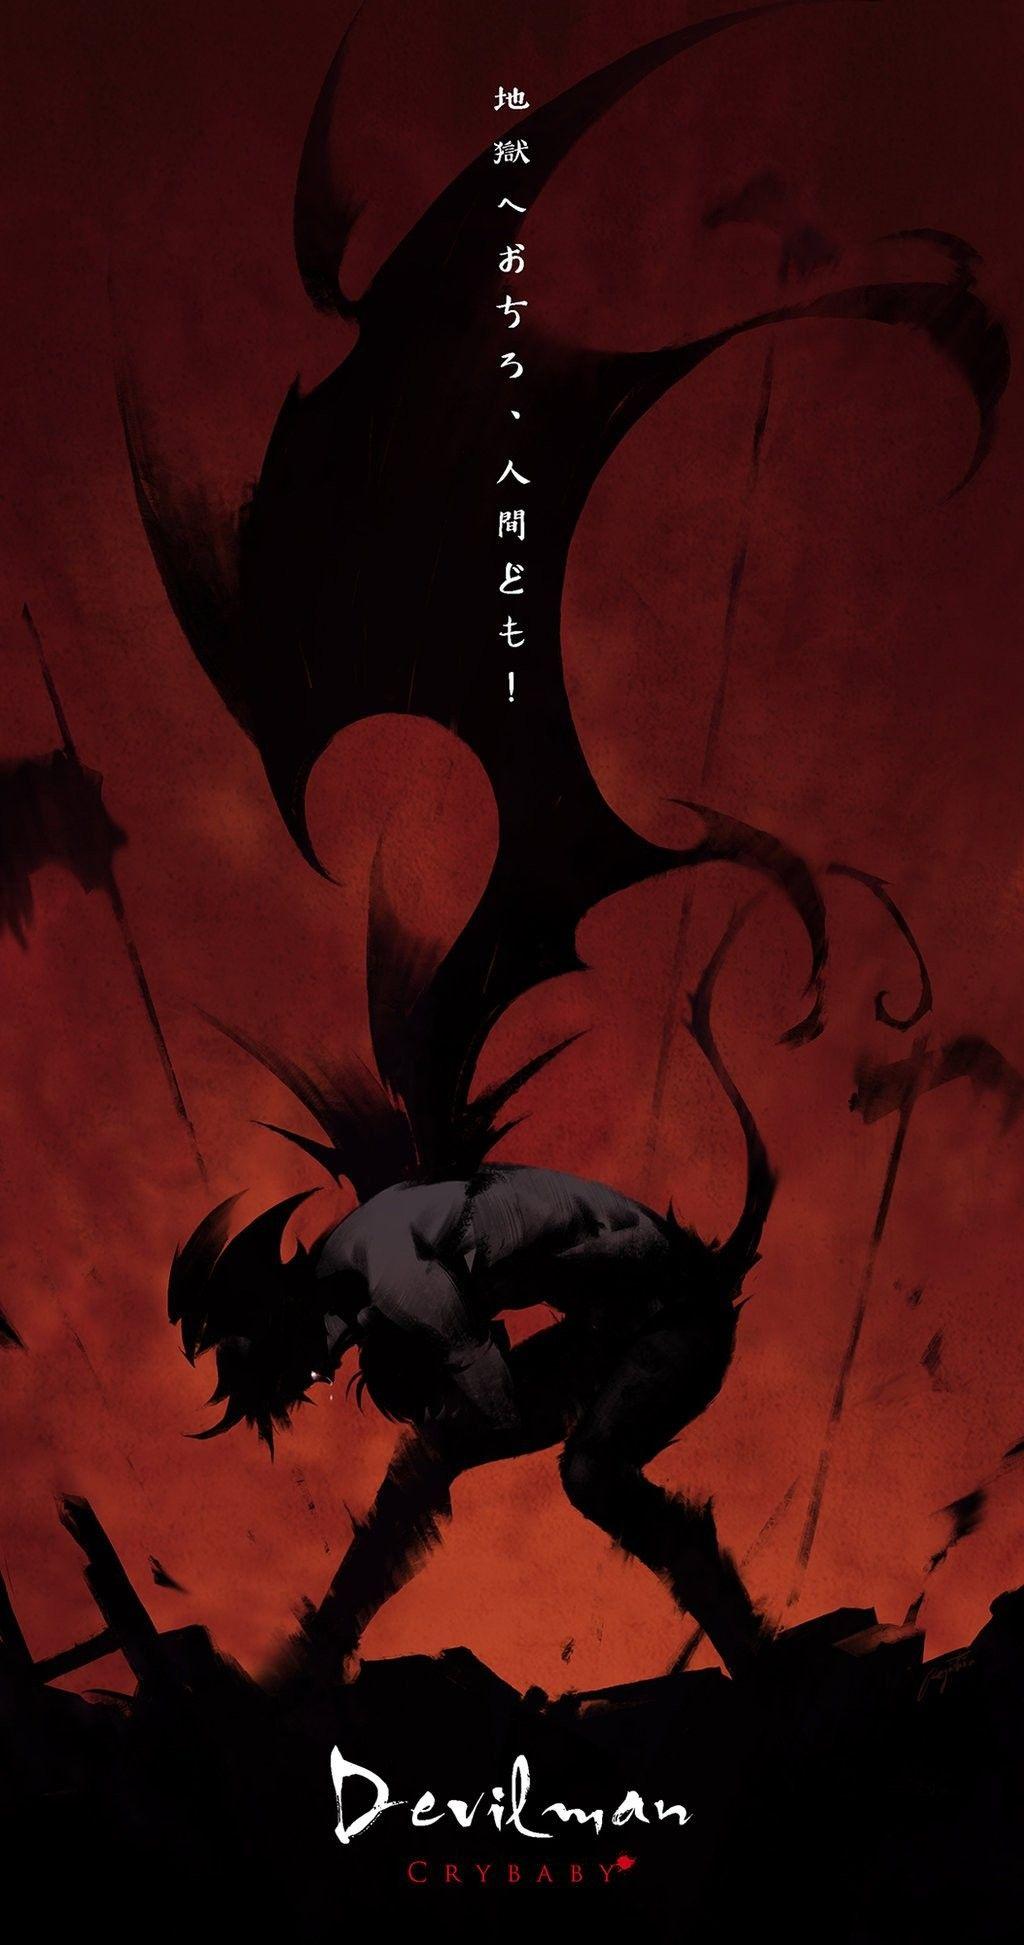 Akira Fudo Devilman Devilman Crybaby Wallpaper Iphone 380303 Hd Wallpaper Backgrounds Download